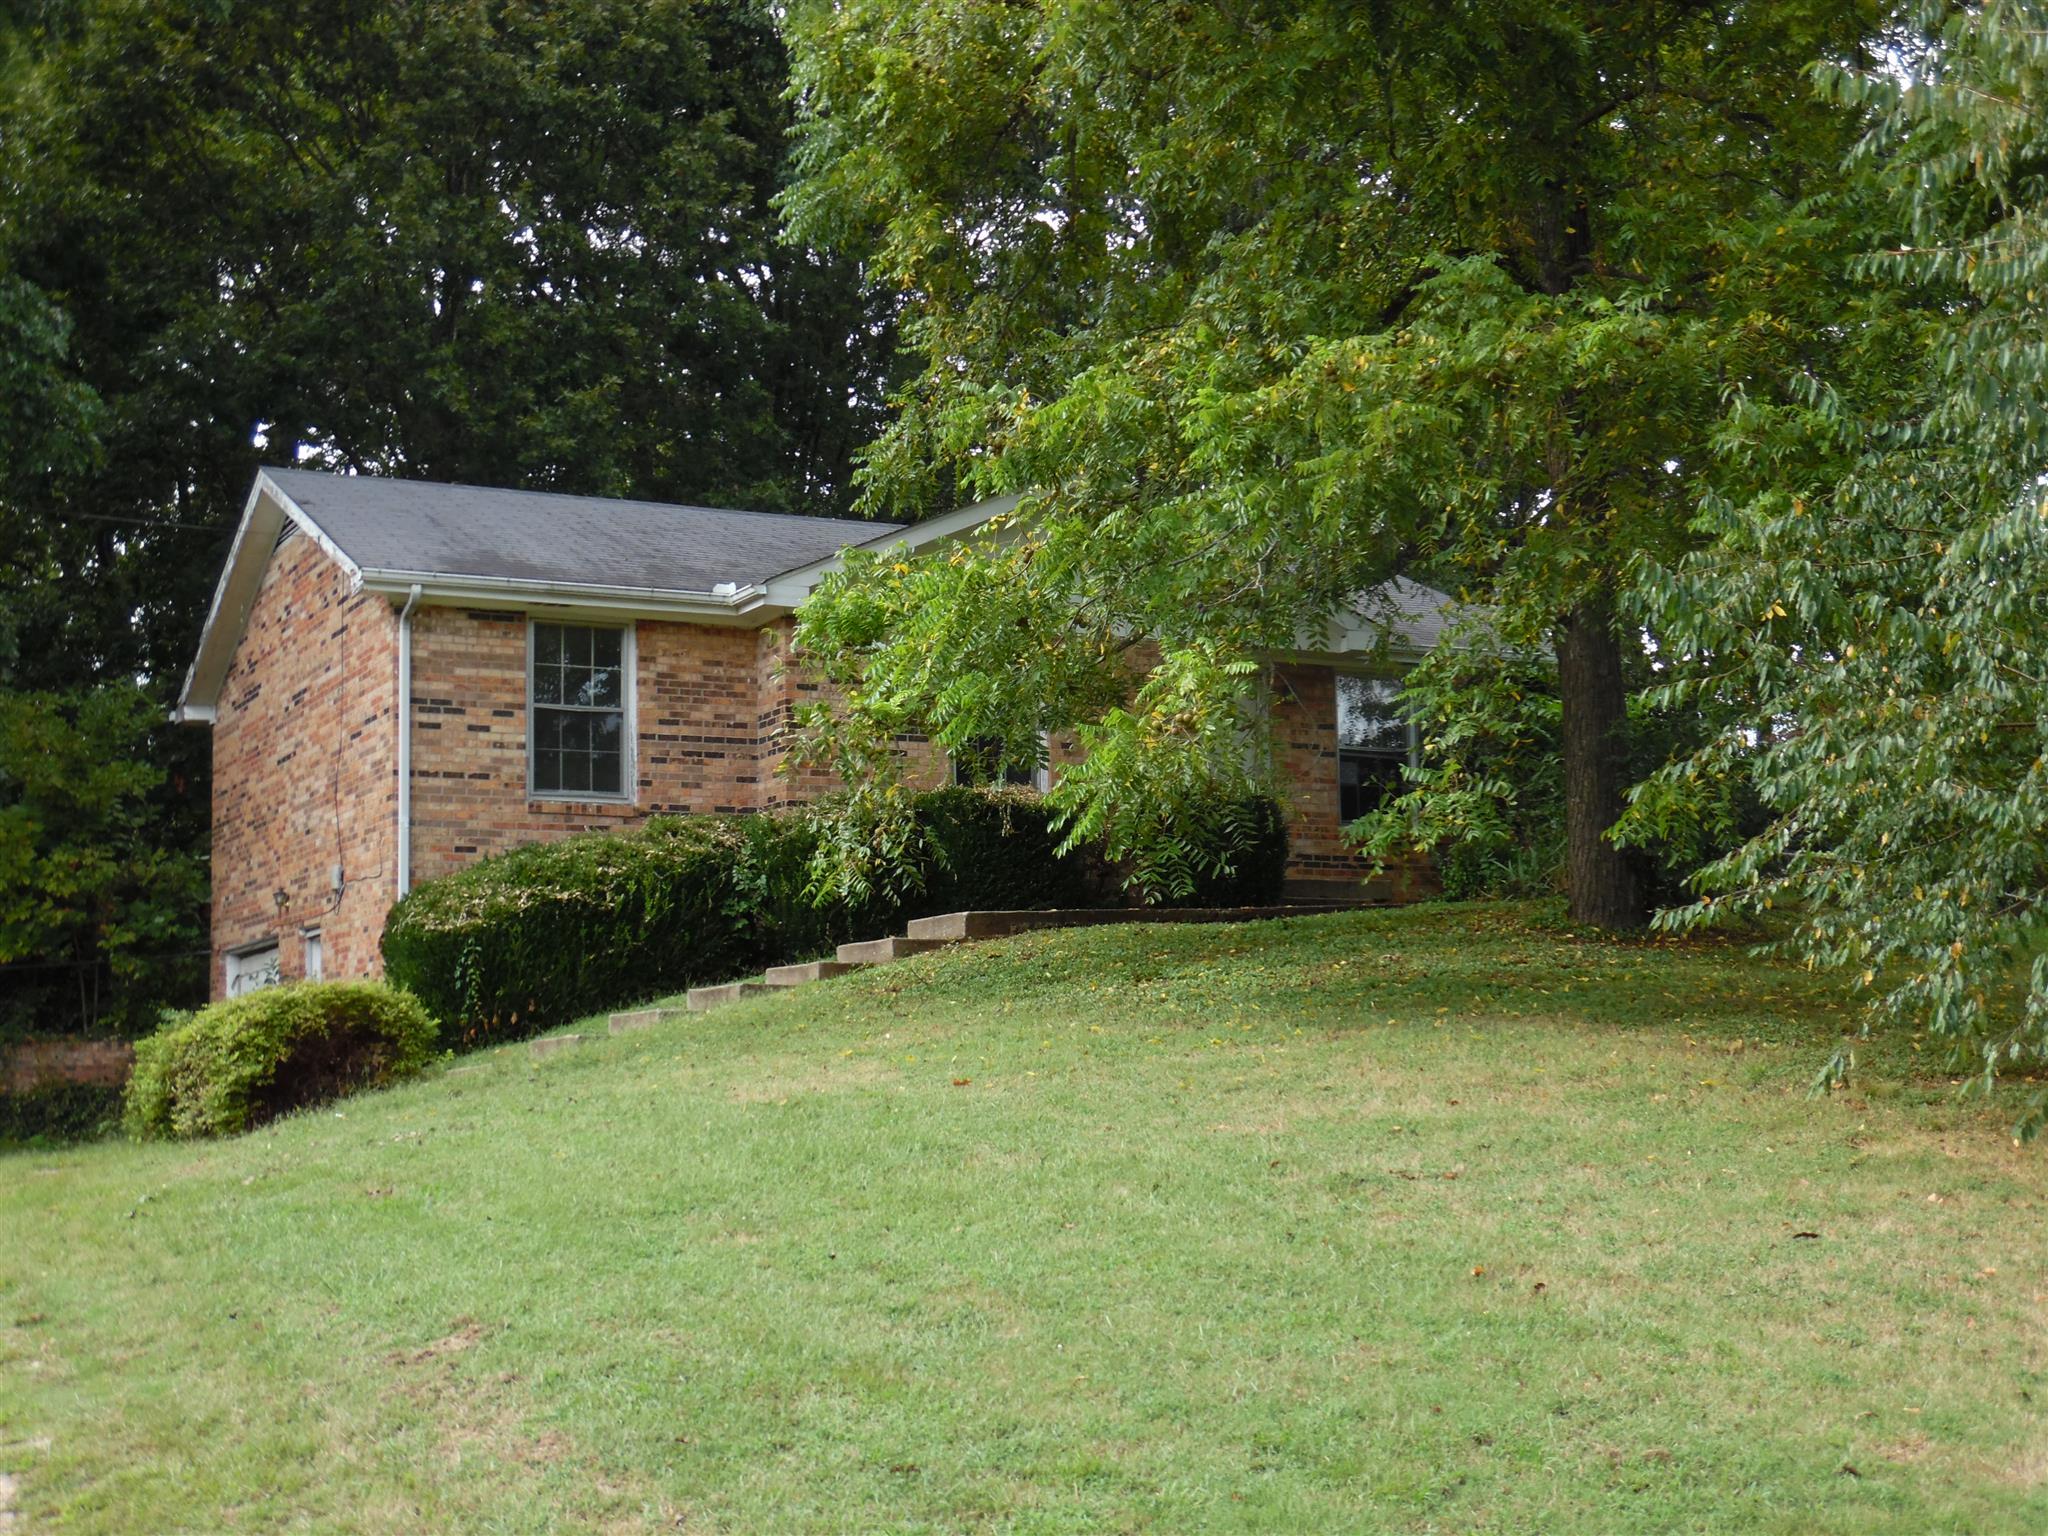 627 Linda Ln, Clarksville, TN 37042